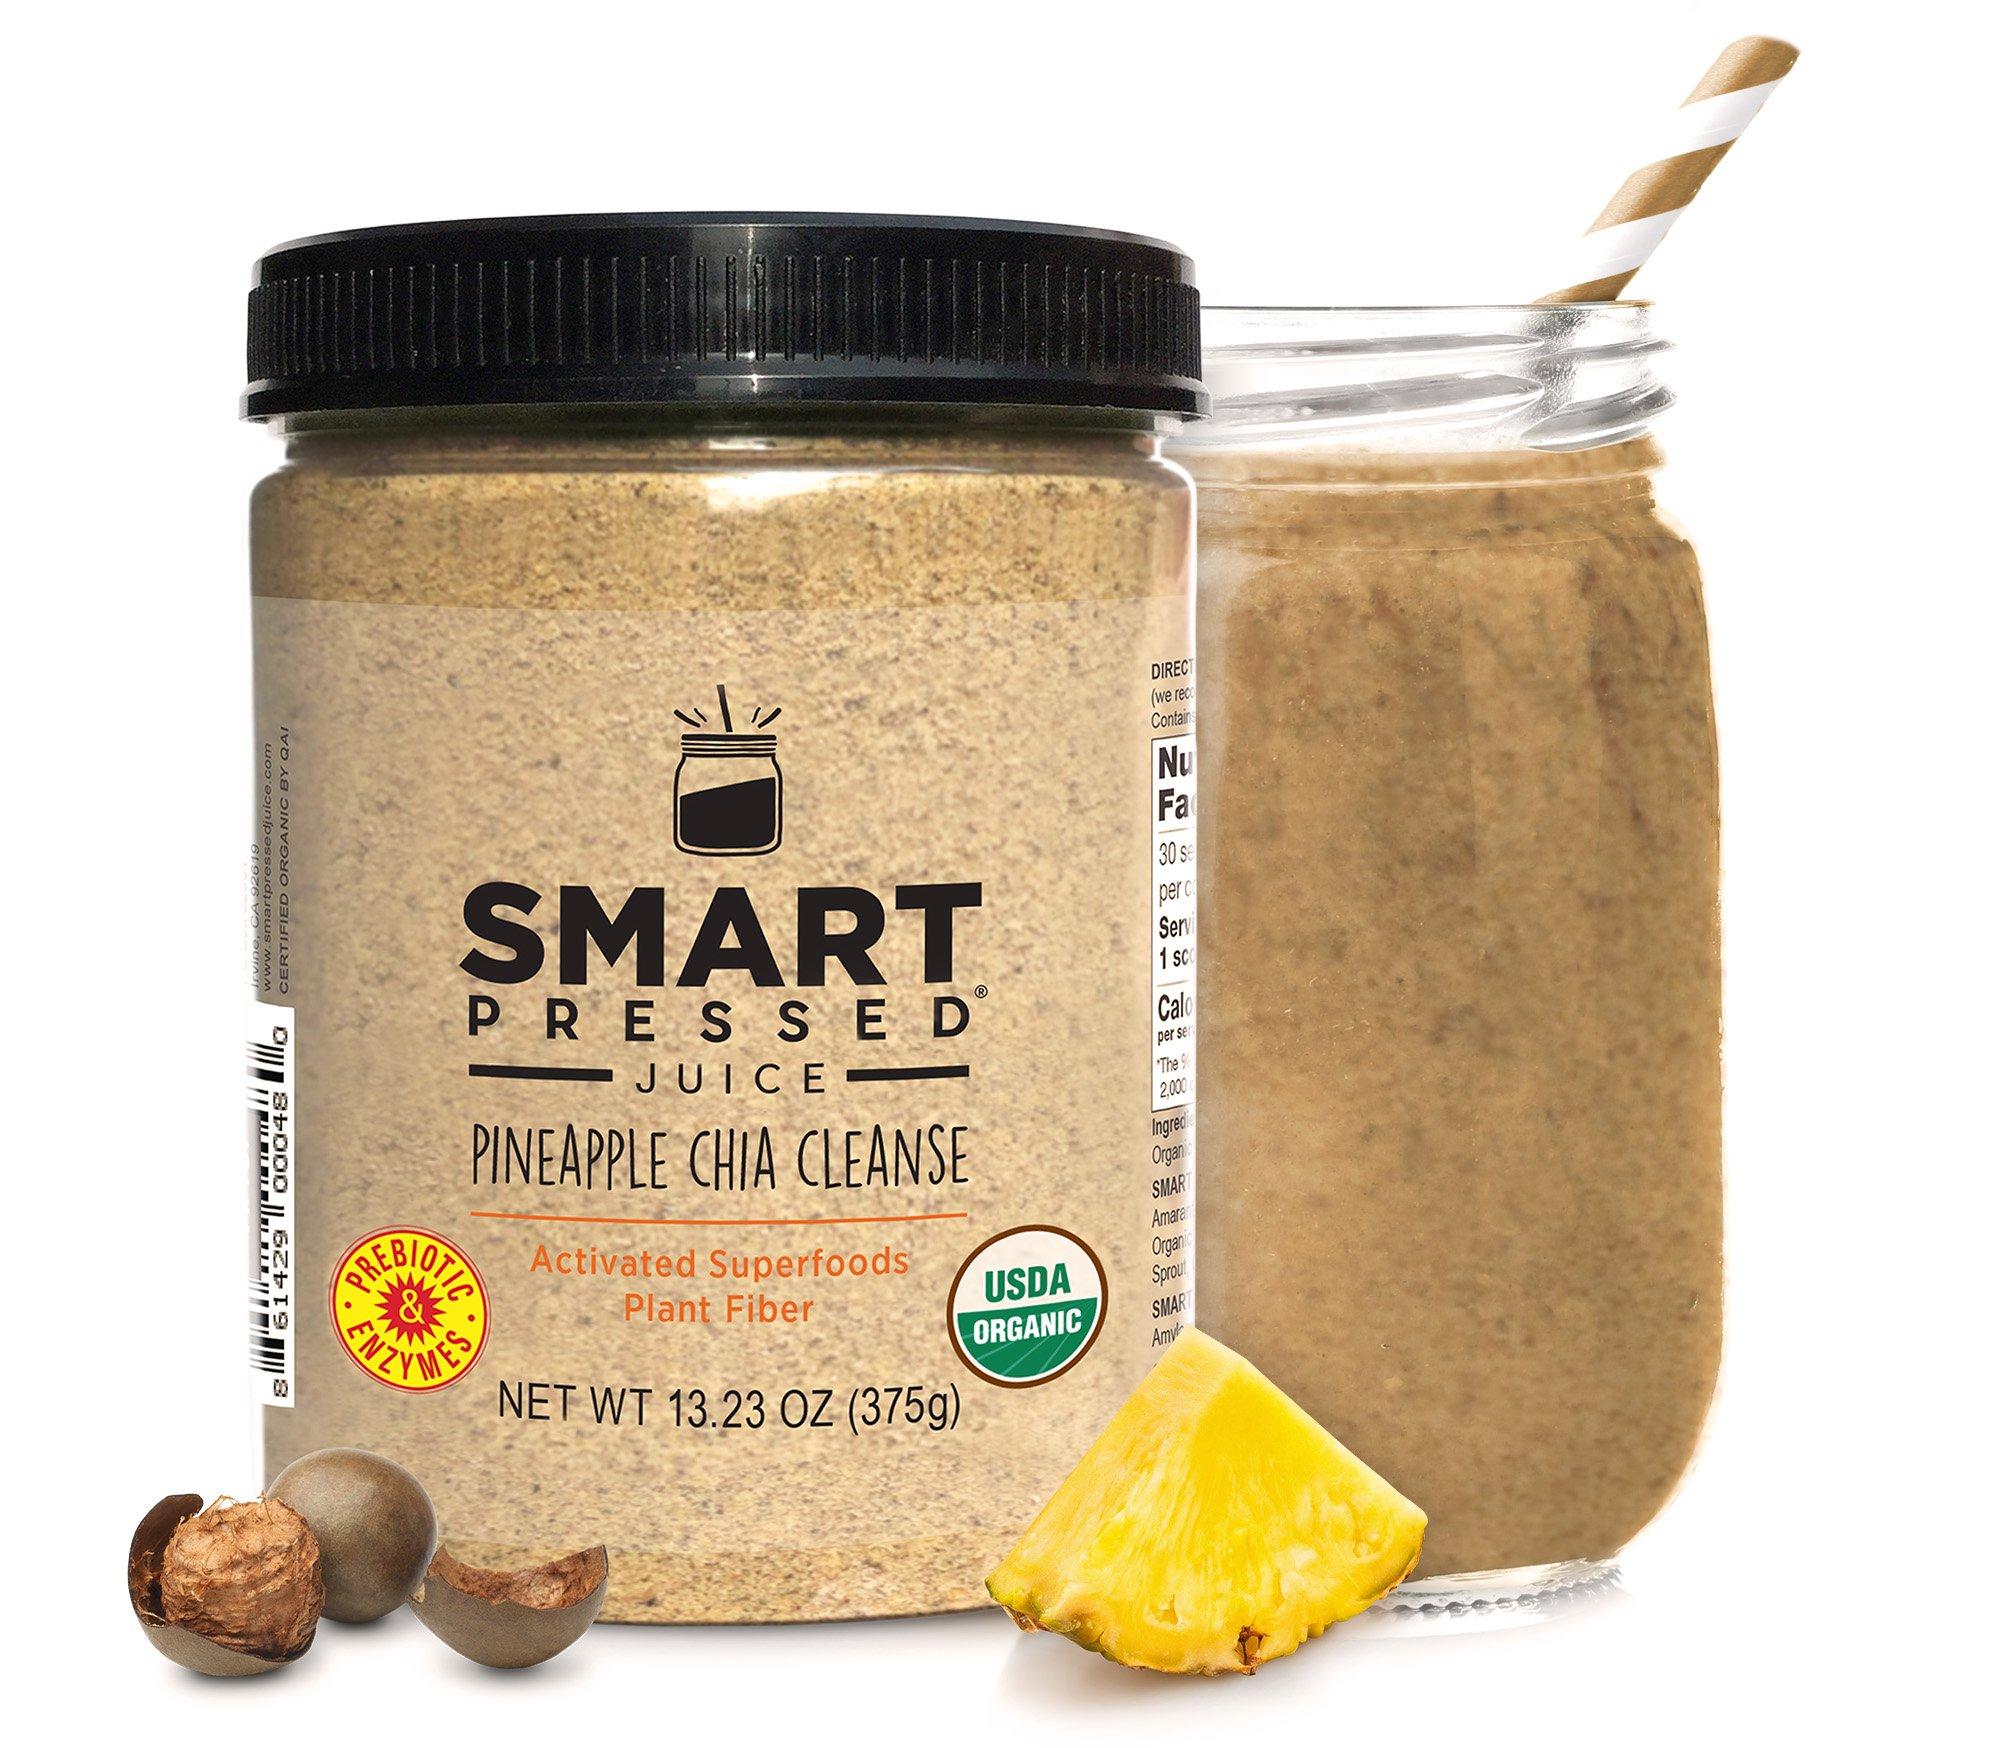 Smart Pressed Juice Pineapple Chia Cleanse Superfood Fiber Weight-Loss Digestive Enzymes Probiotics Prebiotics